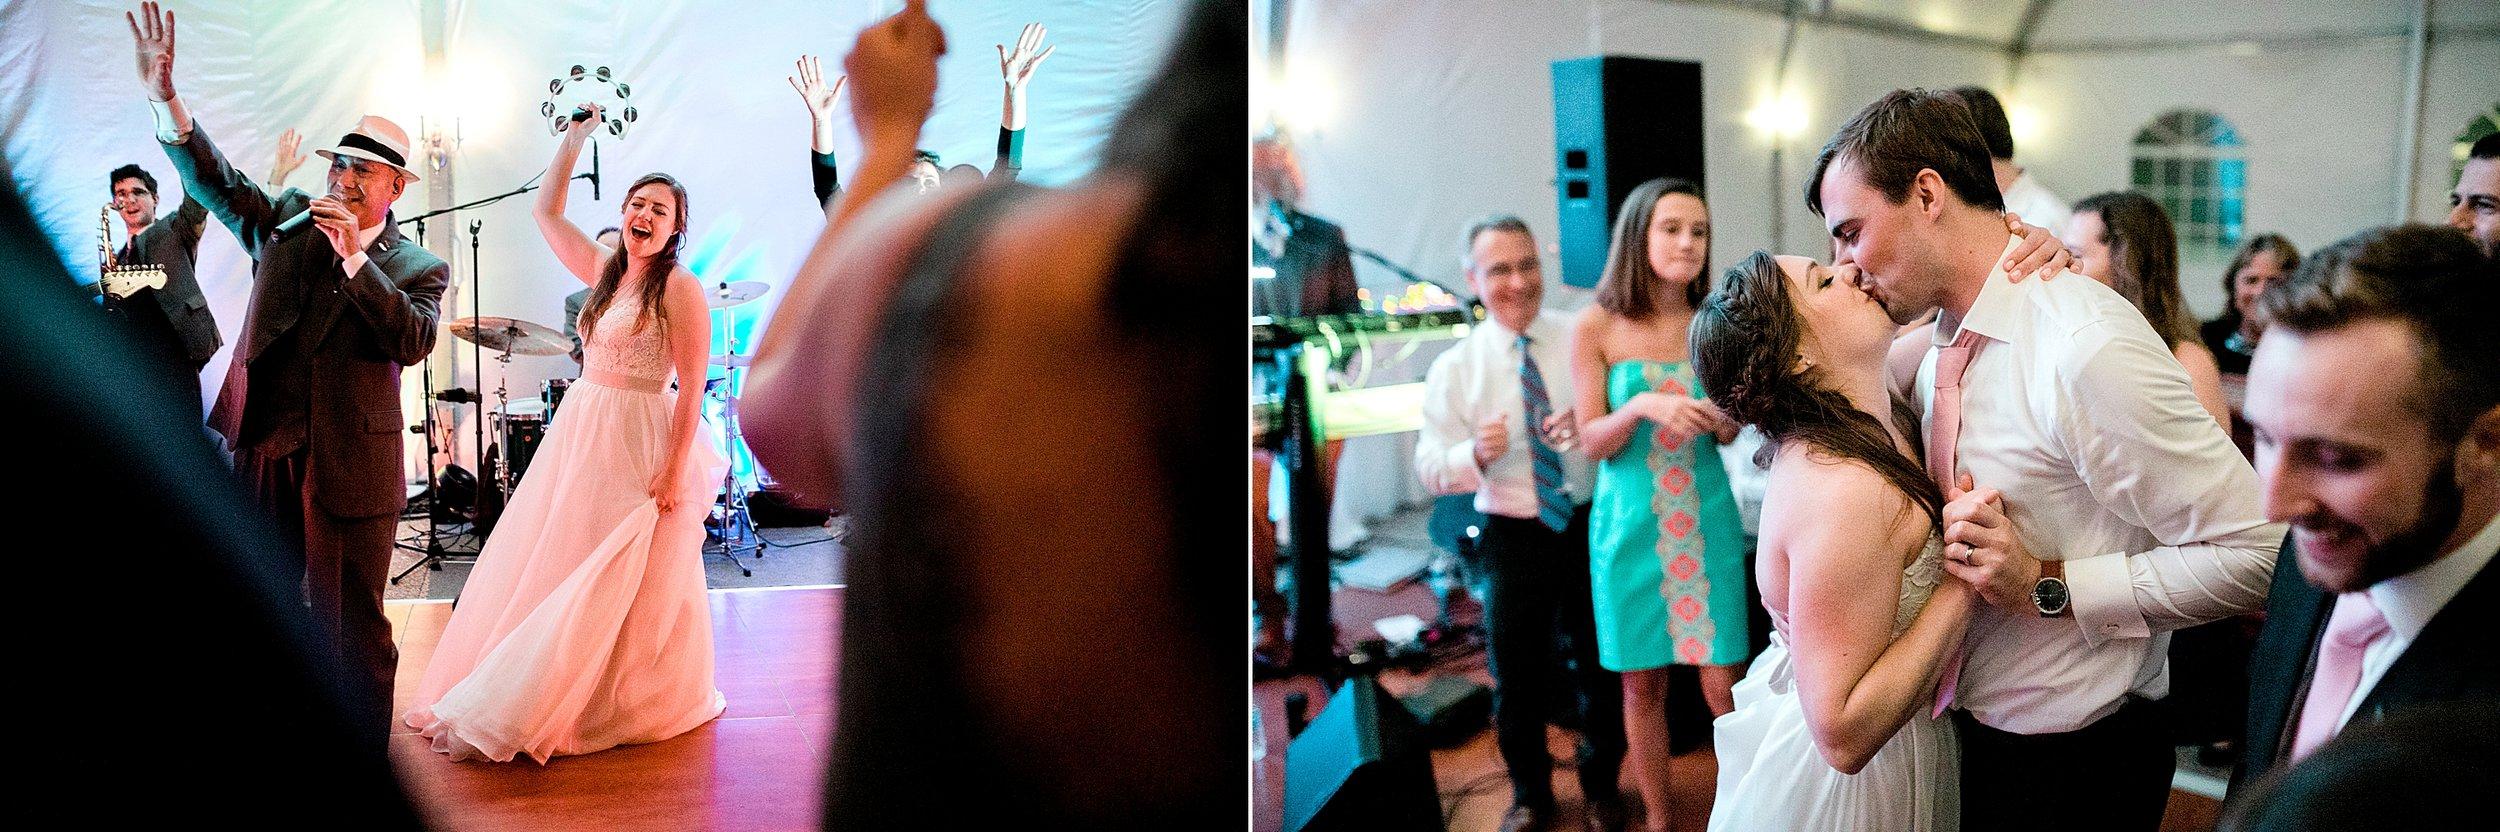 047 los angeles wedding photographer todd danforth photography boston.jpg